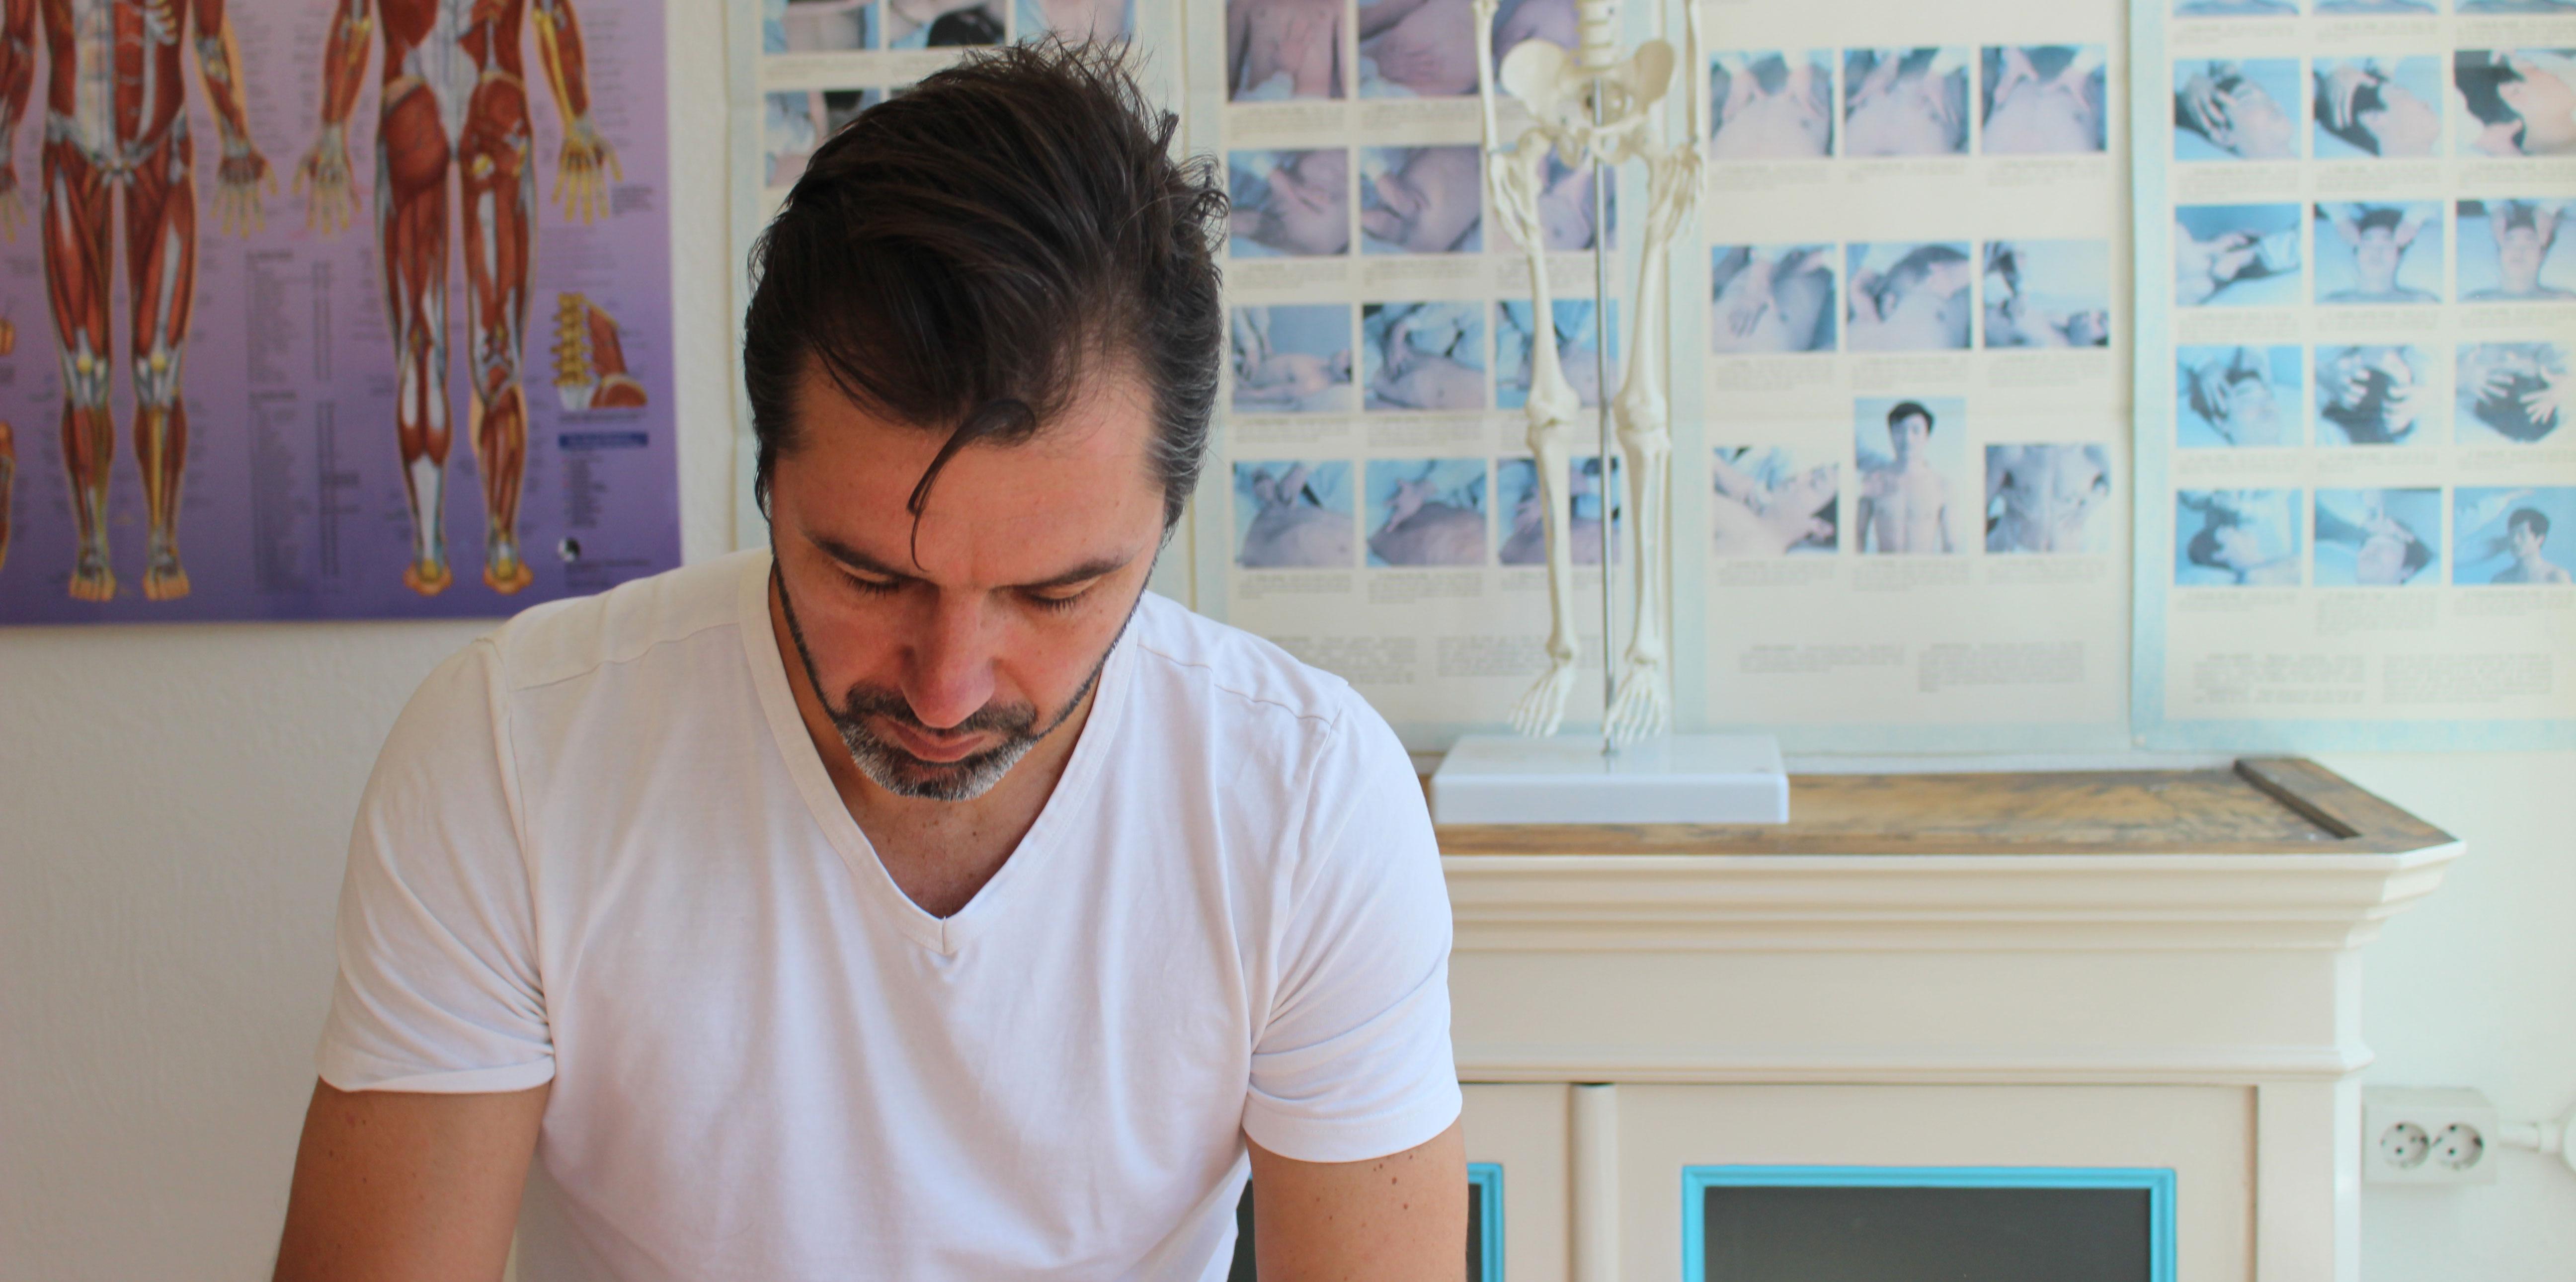 De Witte Os Acupunctuur en Massage in Maastricht